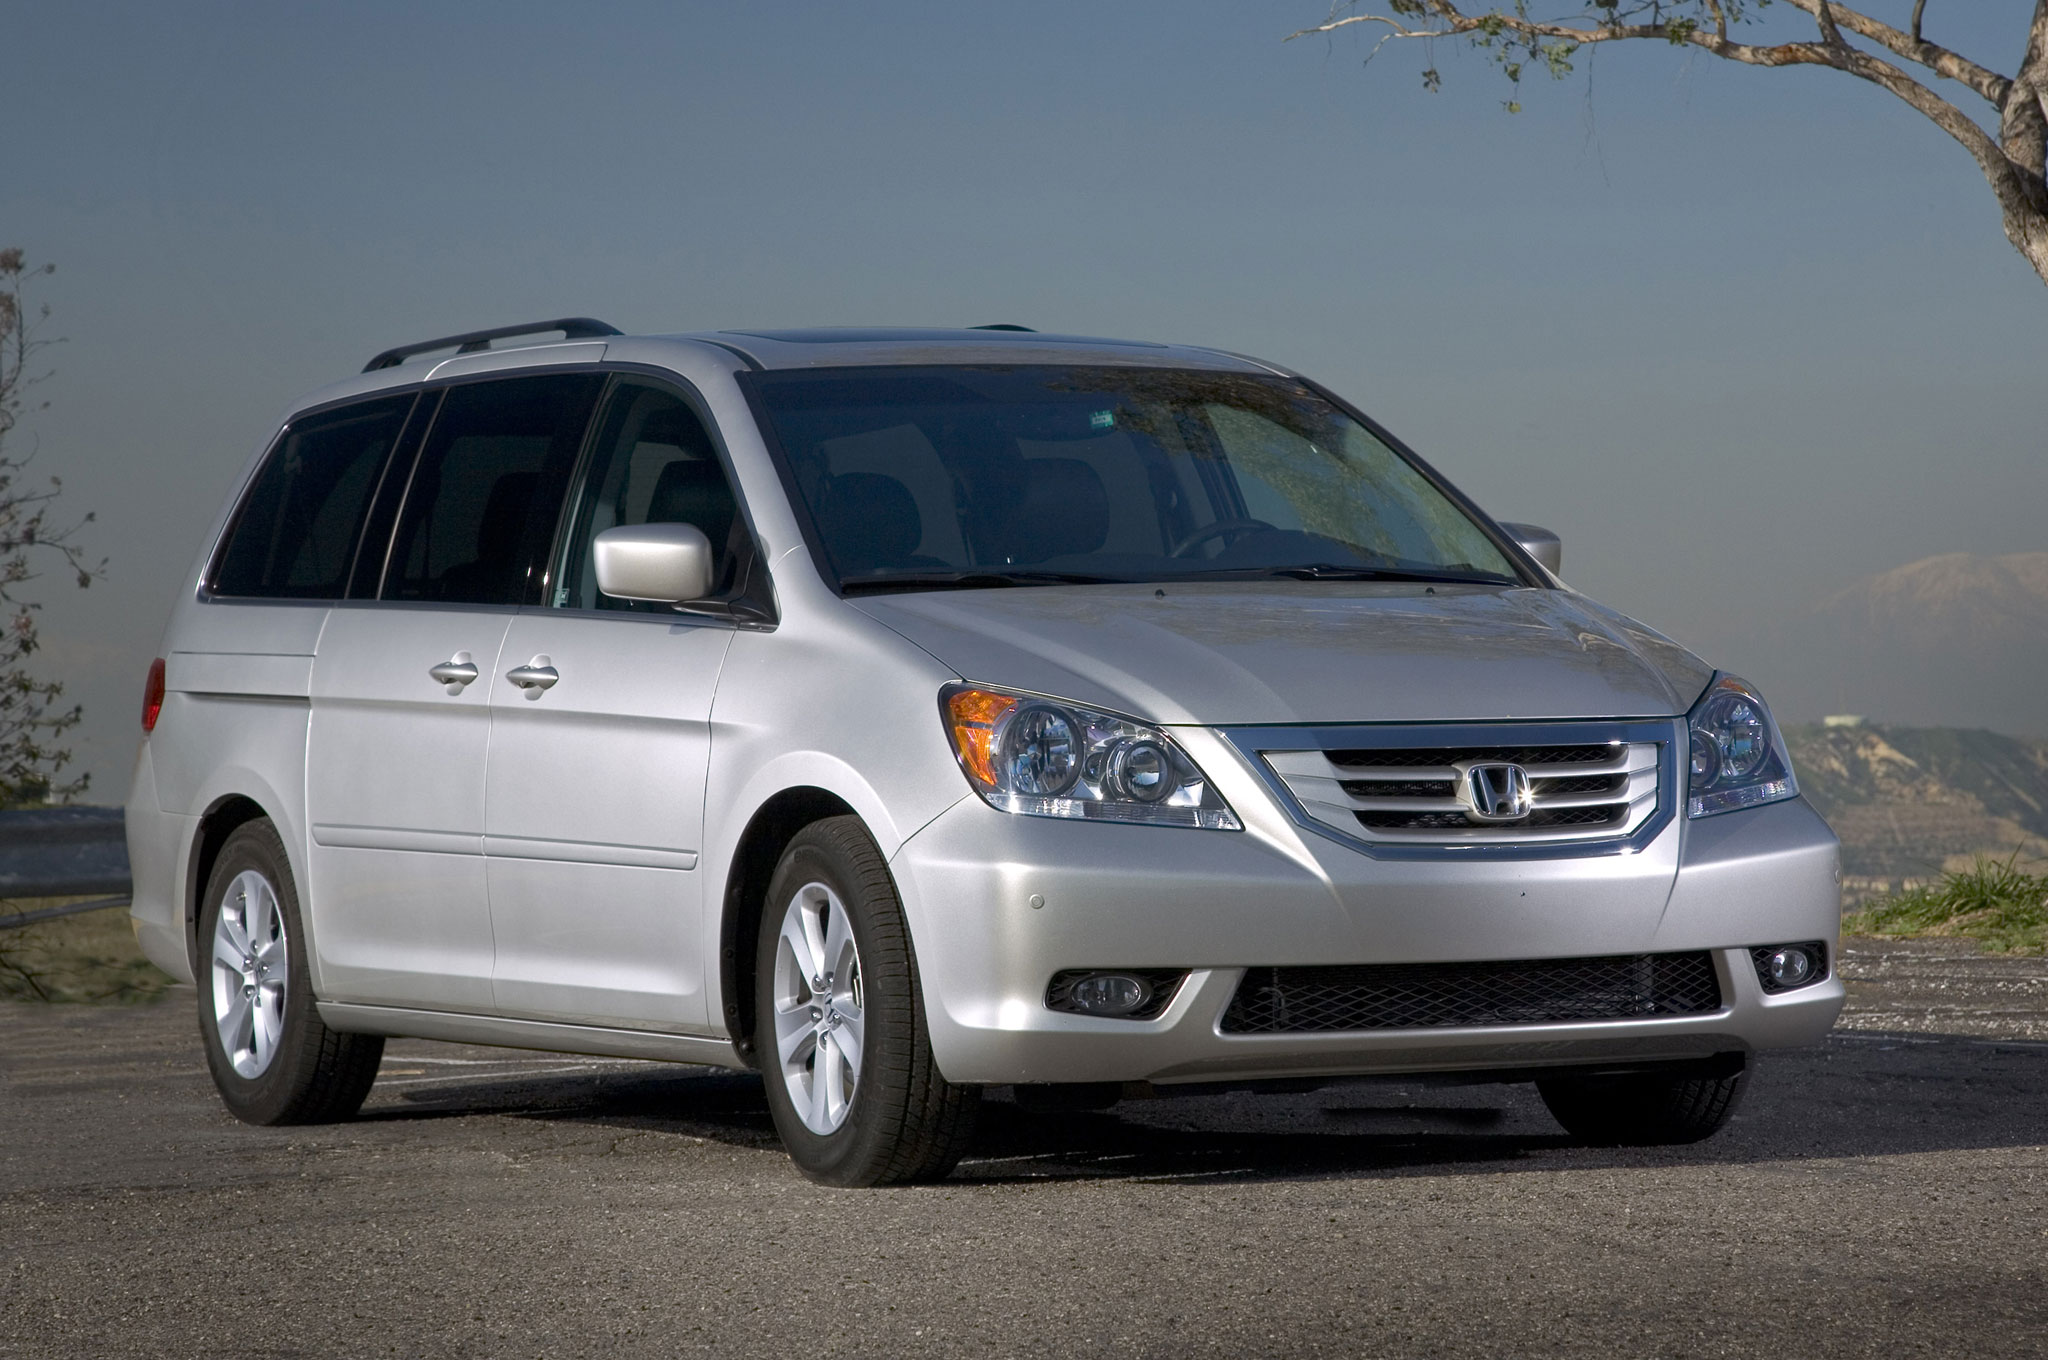 2005-2010 Honda Odyssey Recalled For Fire Risk ...